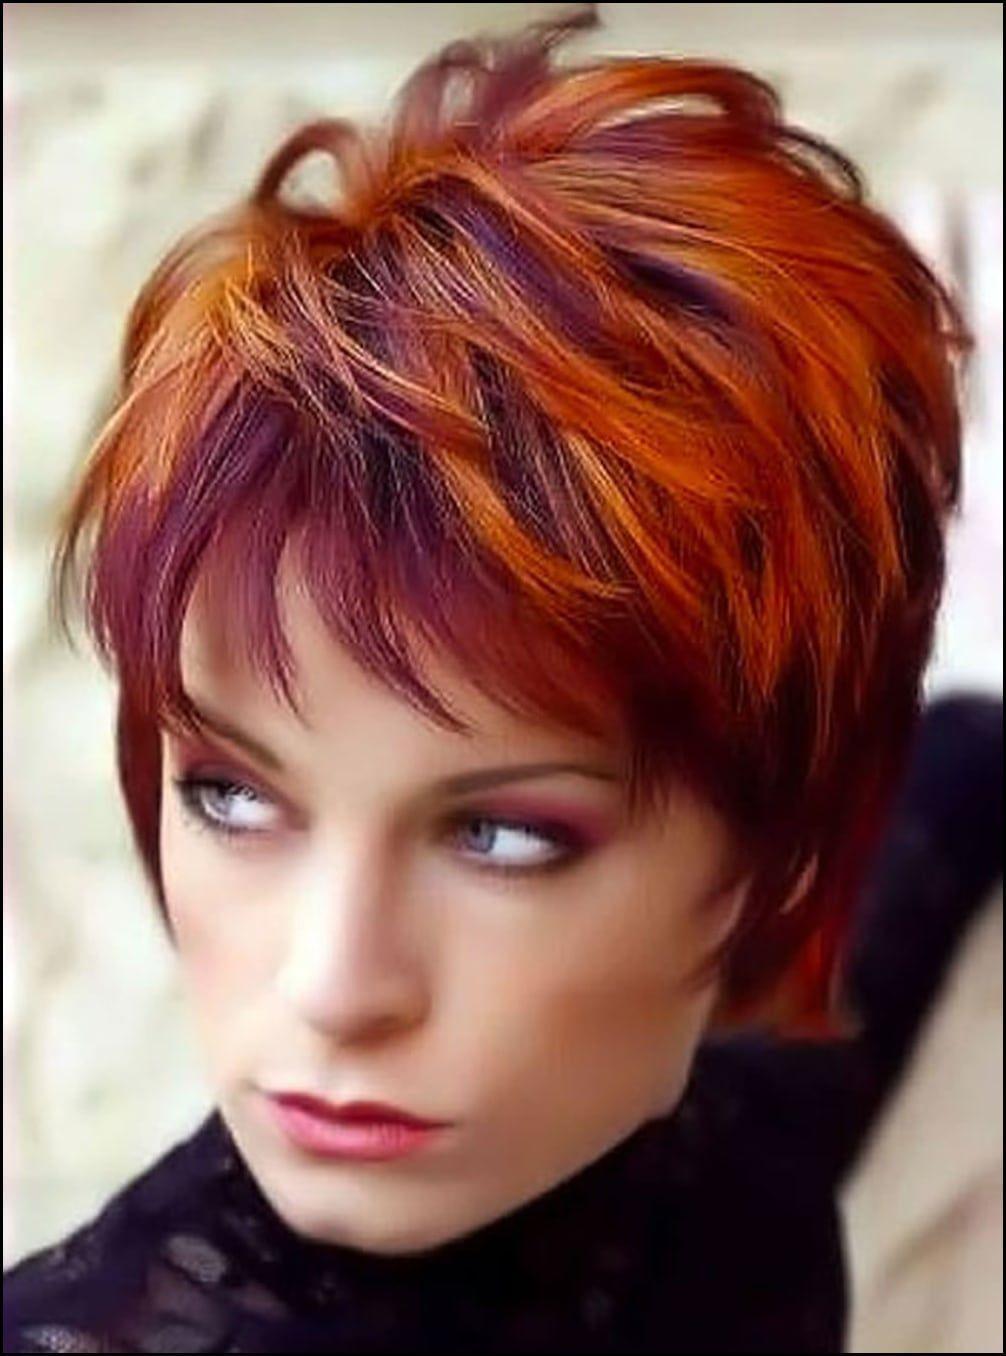 Beste Kurzhaarfrisuren Rot 22 Frisuren Kurze Haare Rot Kurzhaarfrisuren Frisur Rote Haare